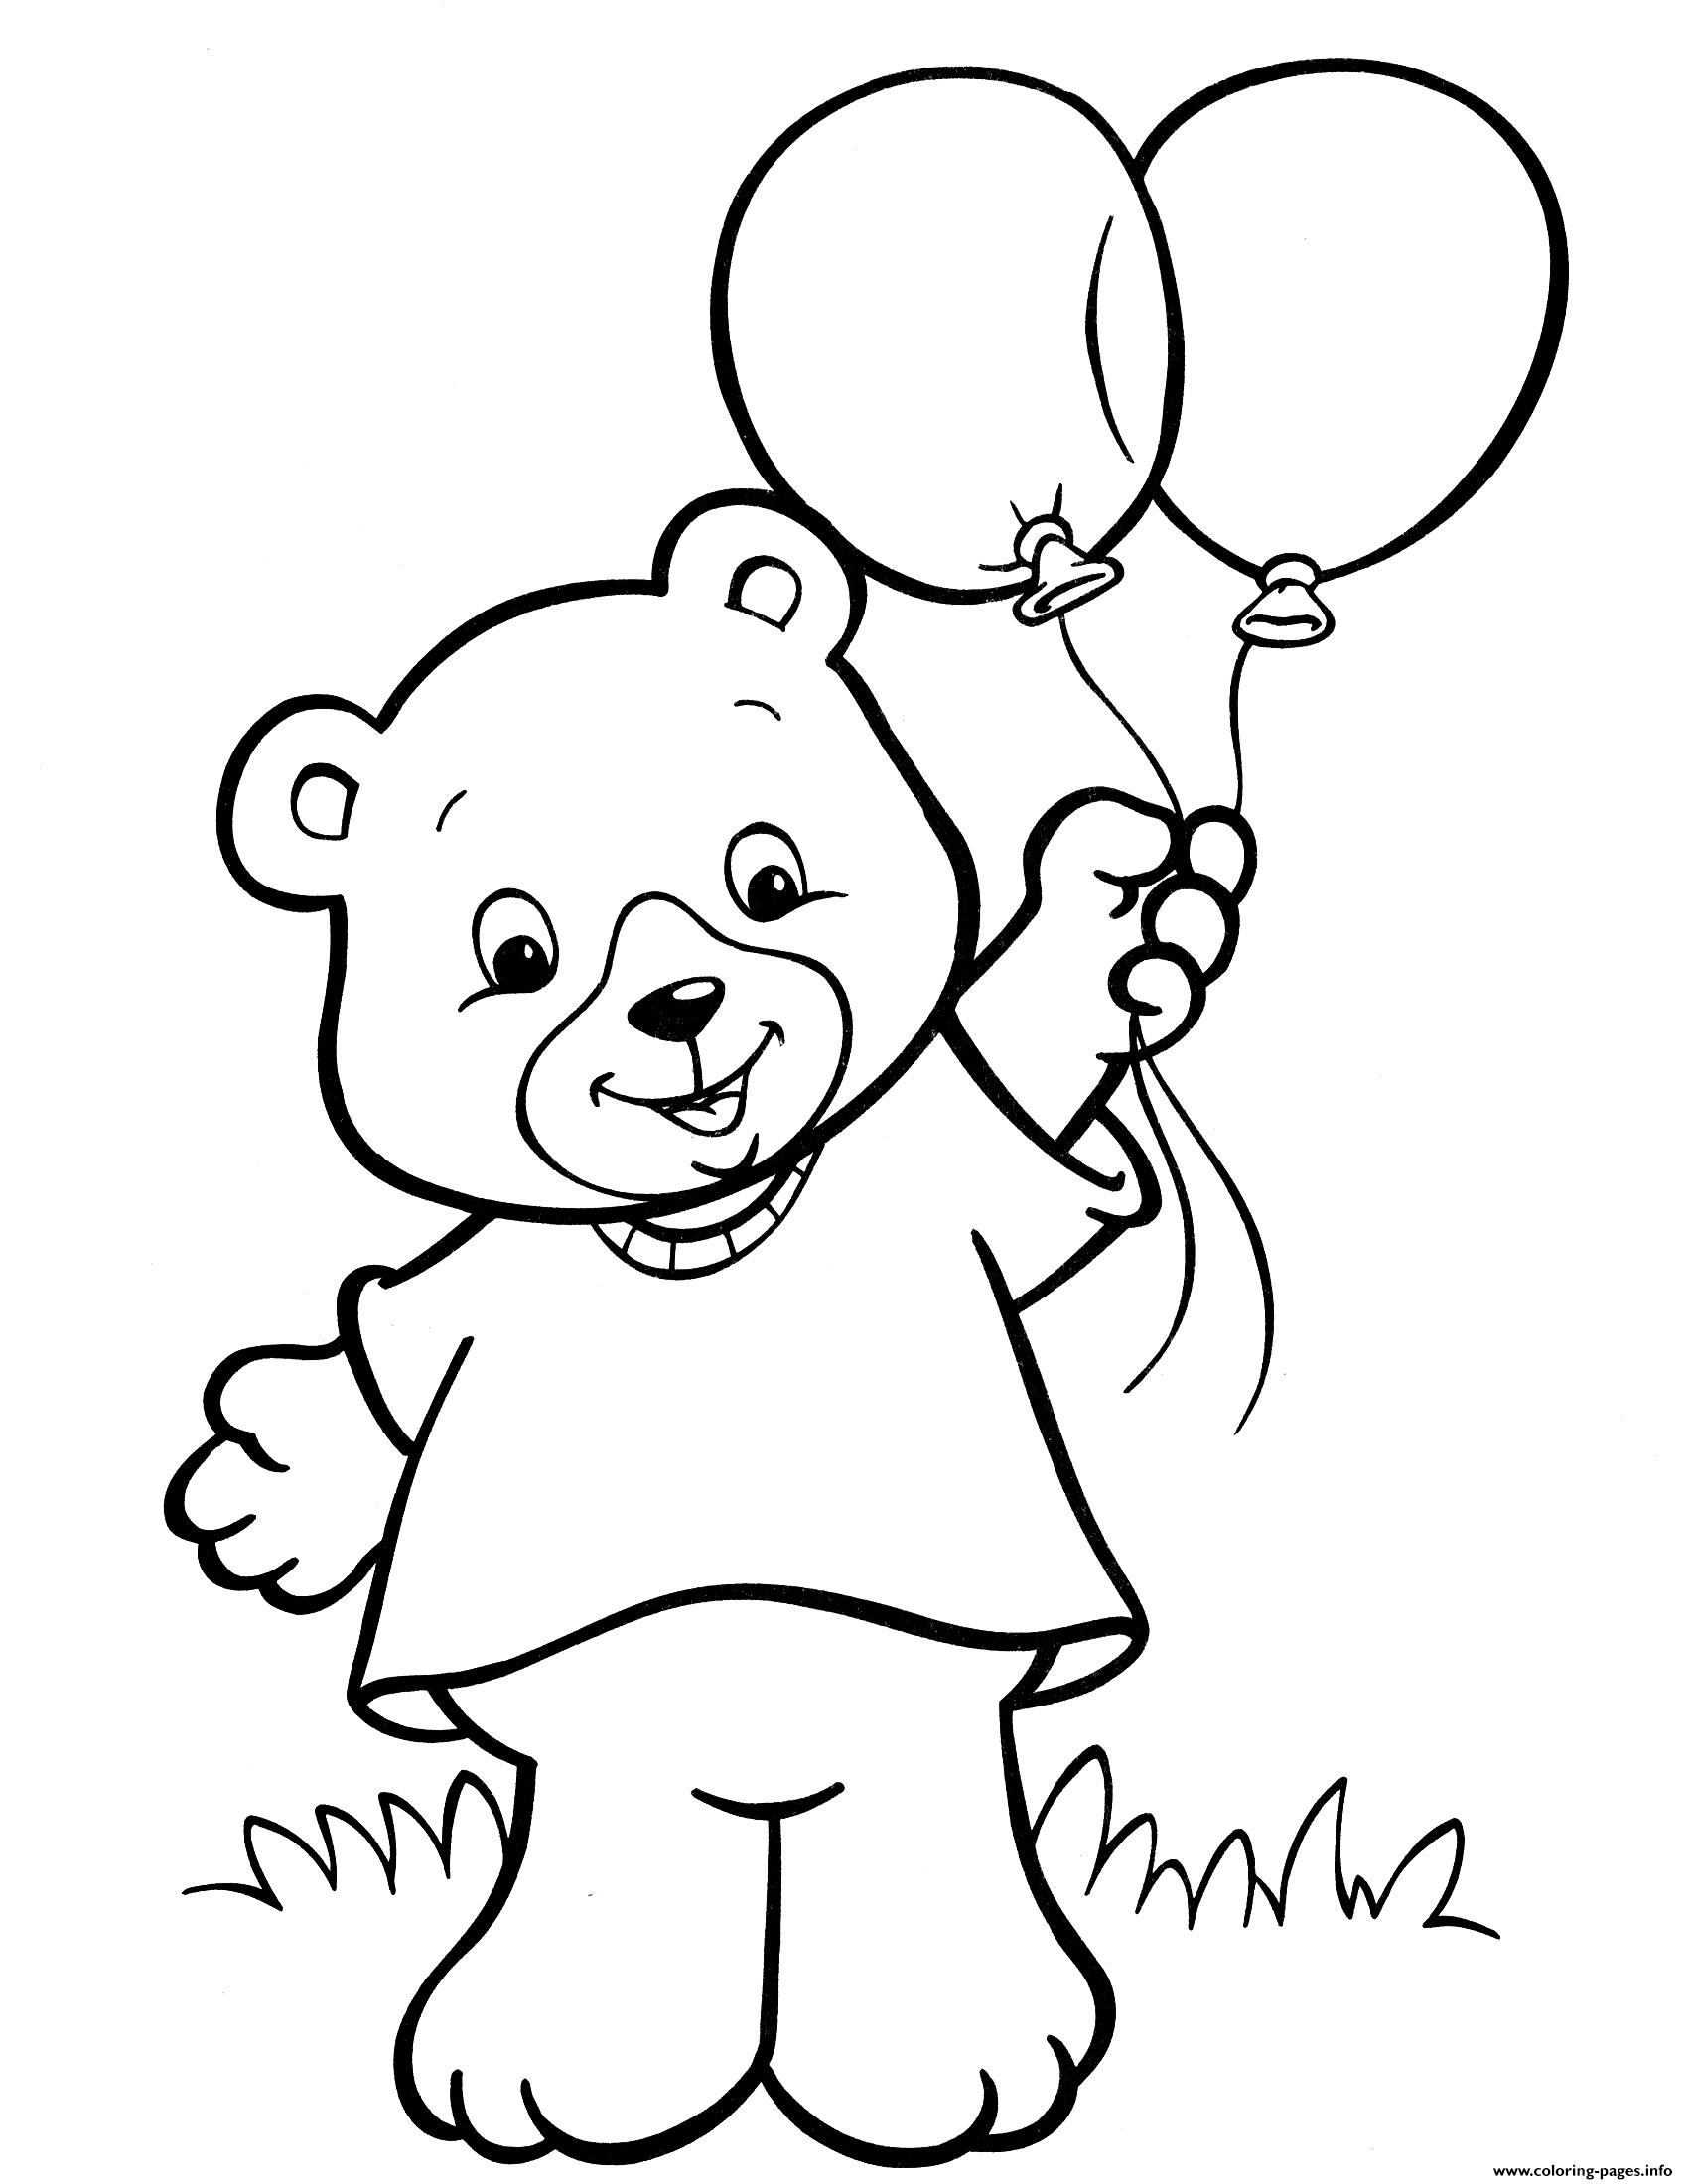 Crayola Teddy Bear Balloon Coloring Pages Printable